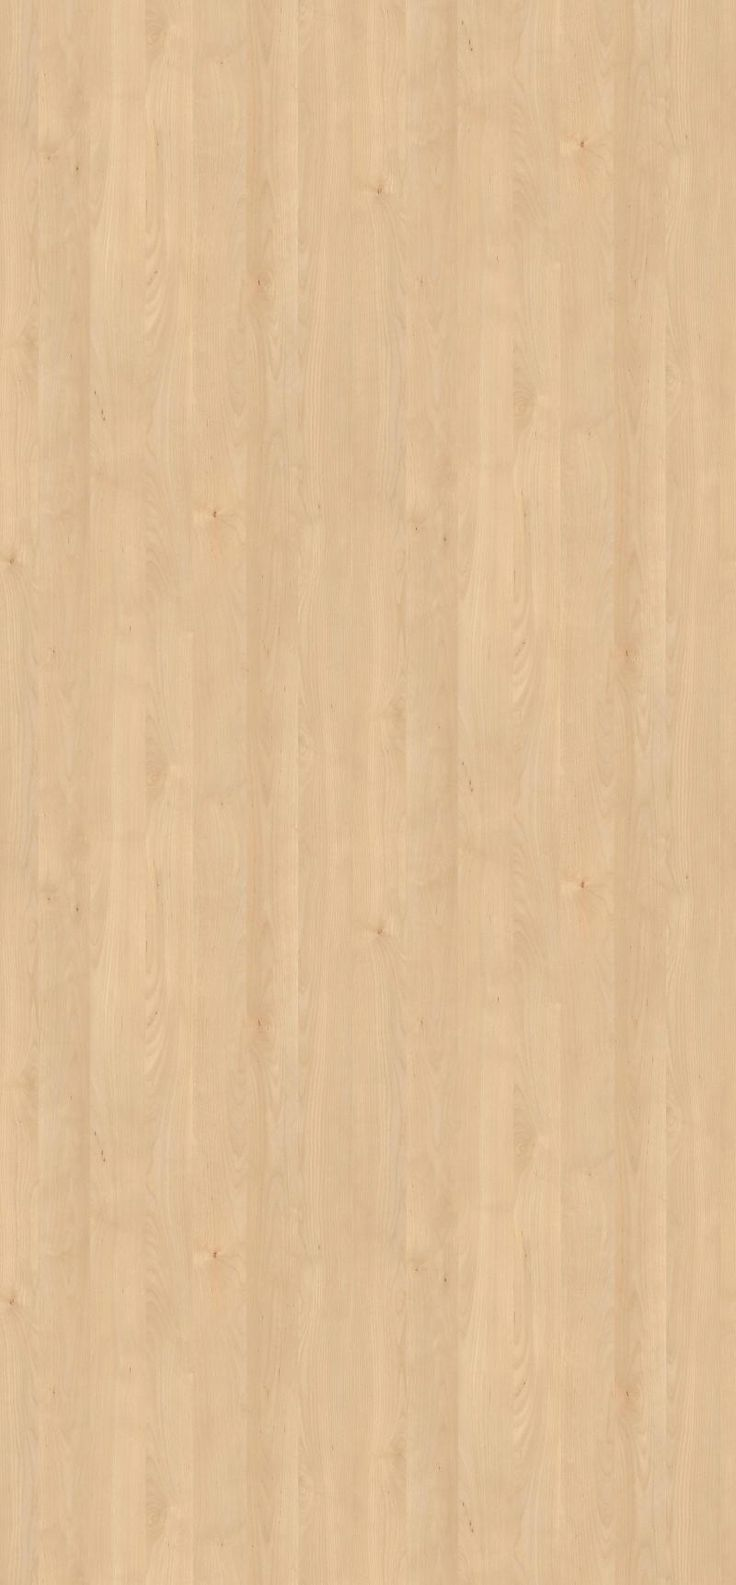 Natúr mandal juhar bútorlap H 3840 ST 9 EGGER